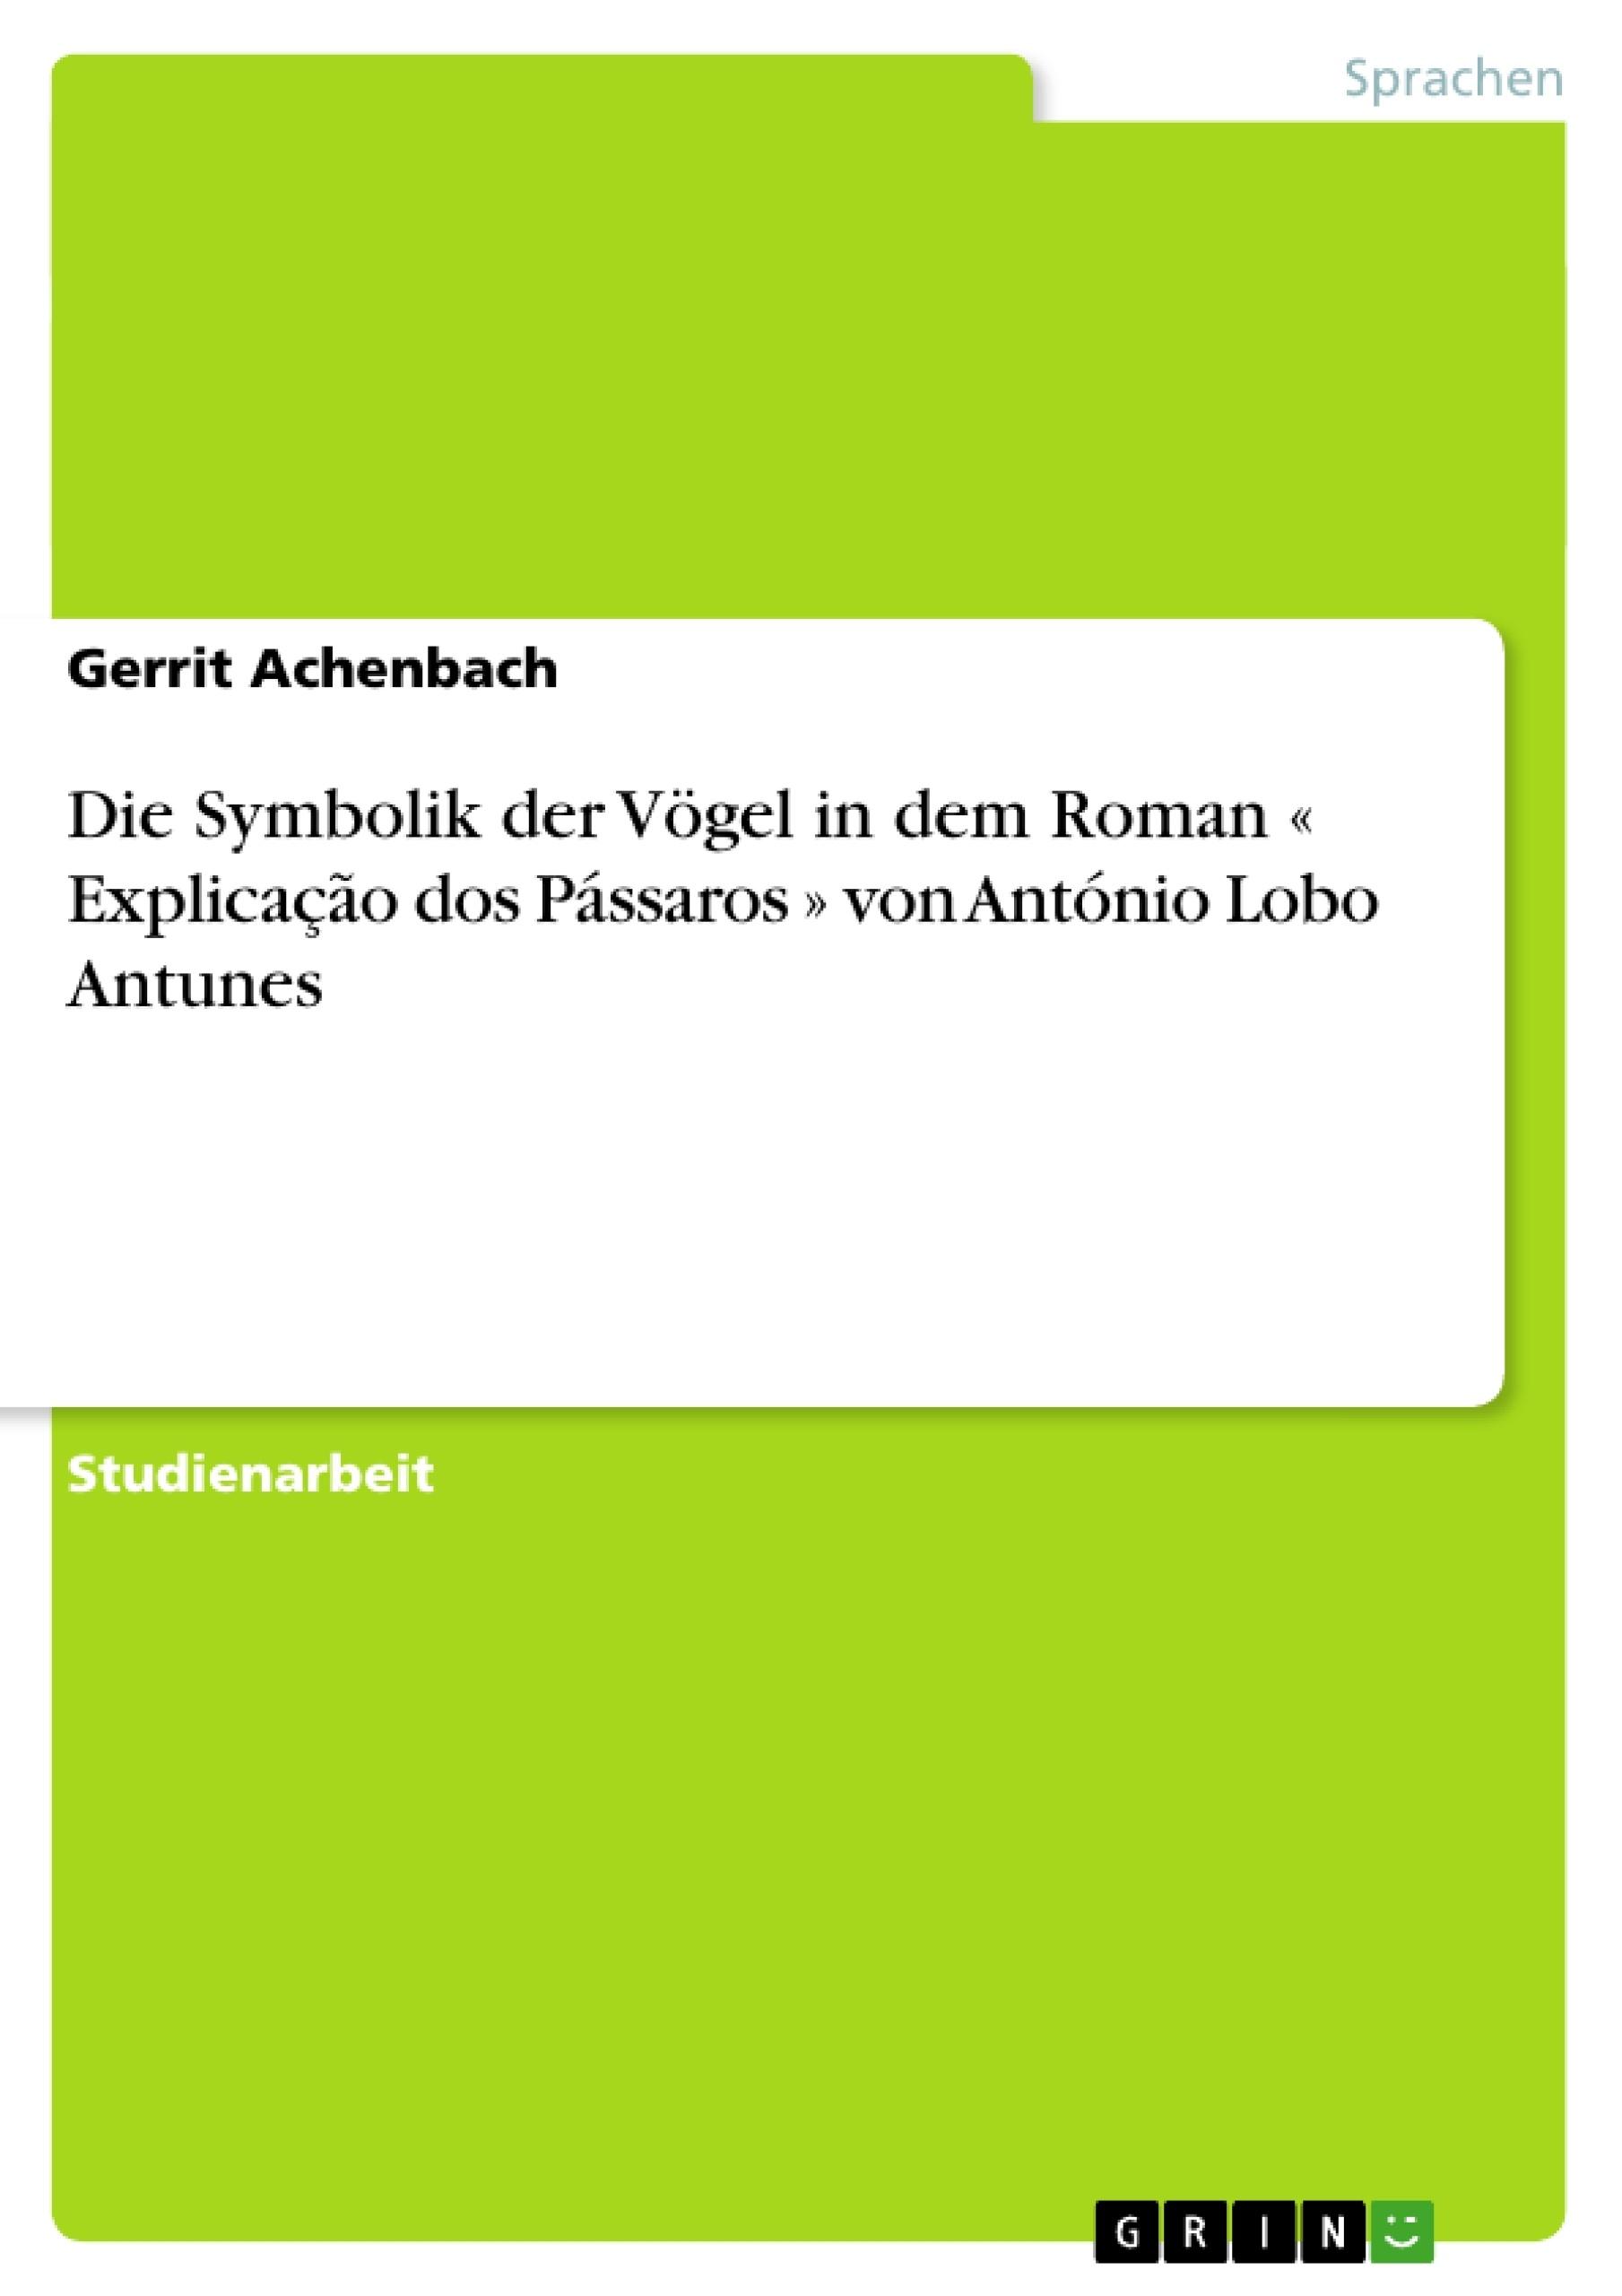 Titel: Die Symbolik der Vögel  in dem Roman « Explicação dos Pássaros » von António Lobo Antunes